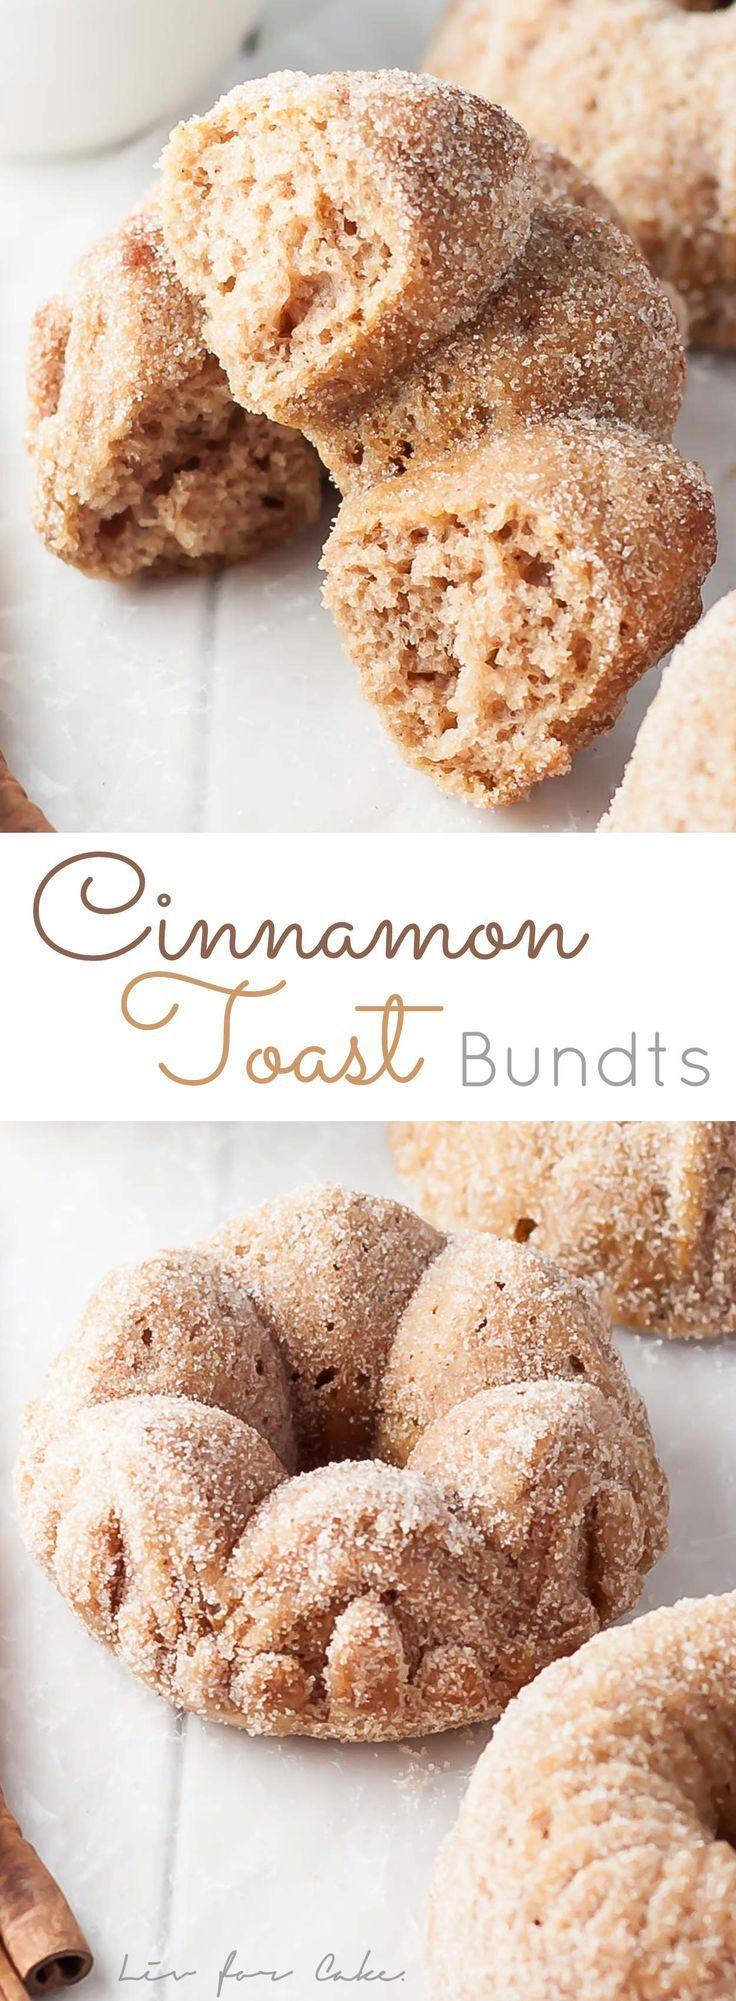 Cinnamon toast bundts bundtbakers liv for cake